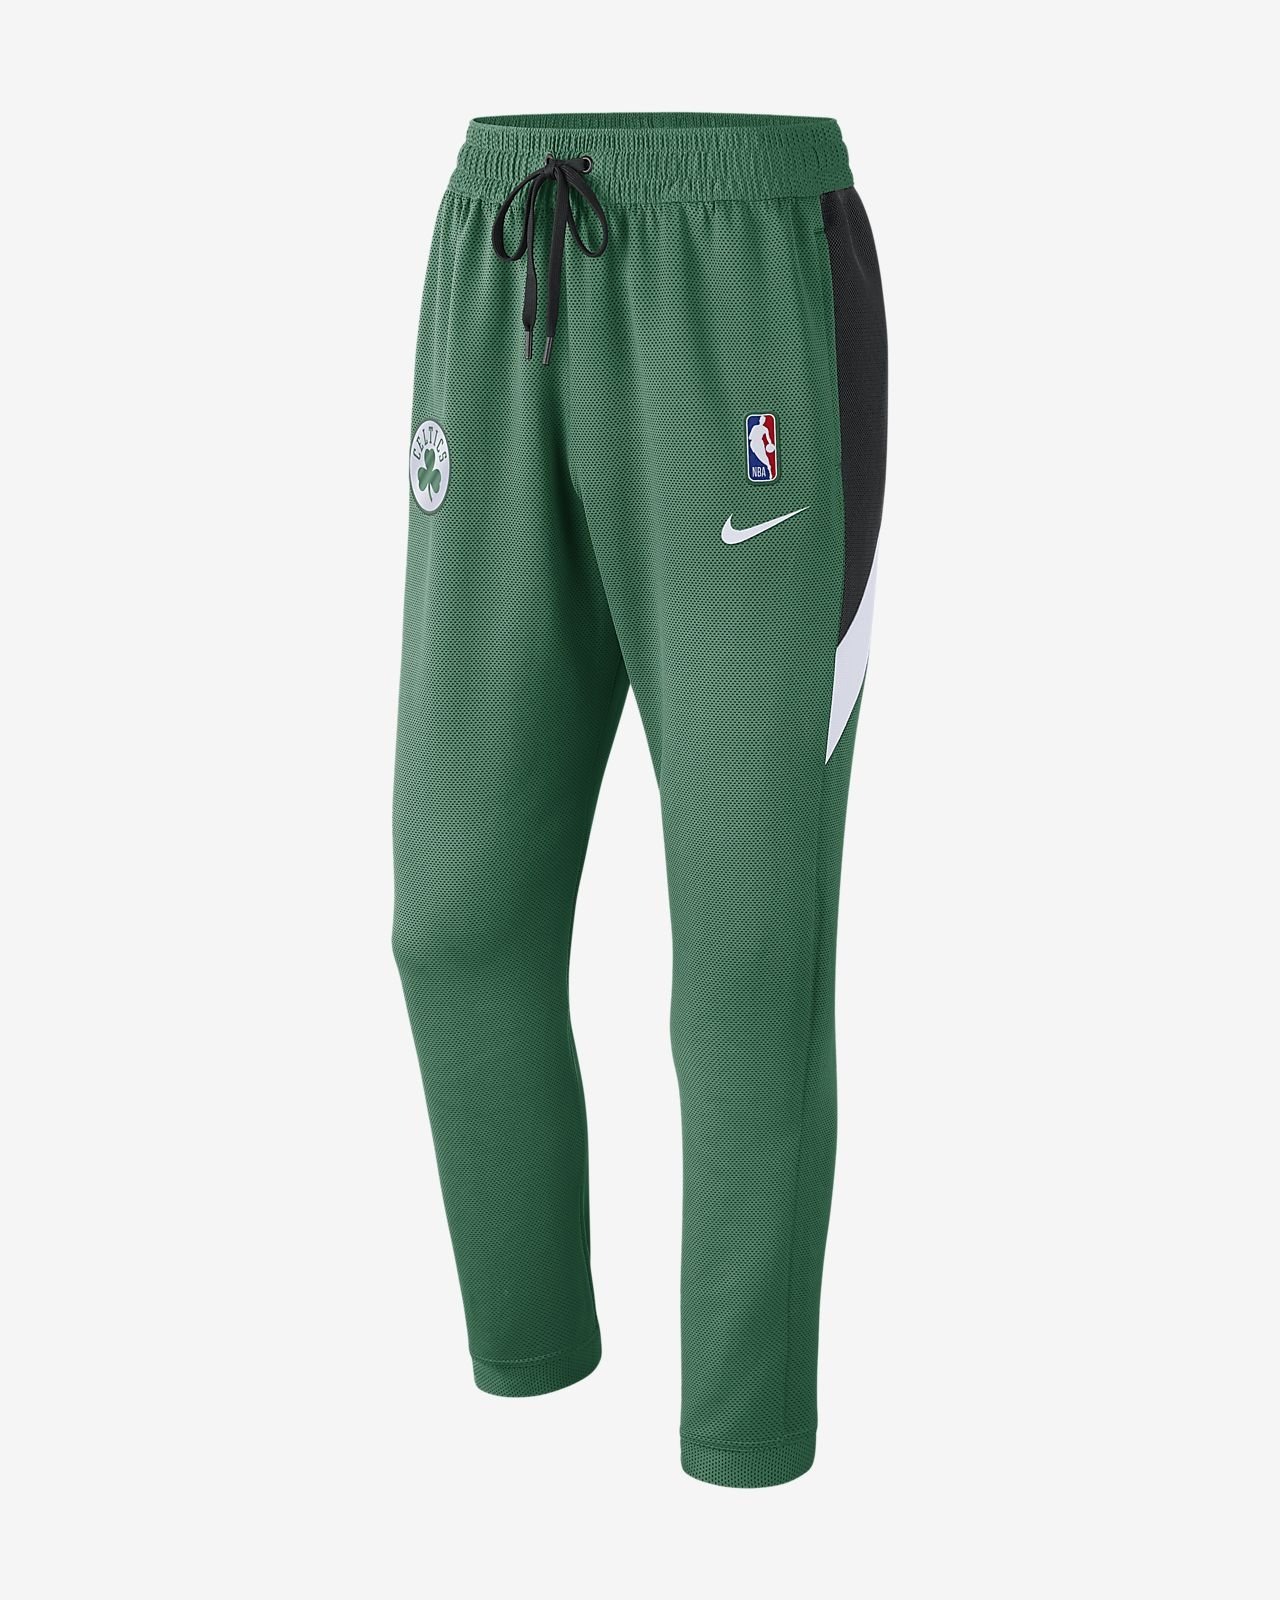 Boston Celtics Nike Therma Flex Showtime NBA-Hose für Herren